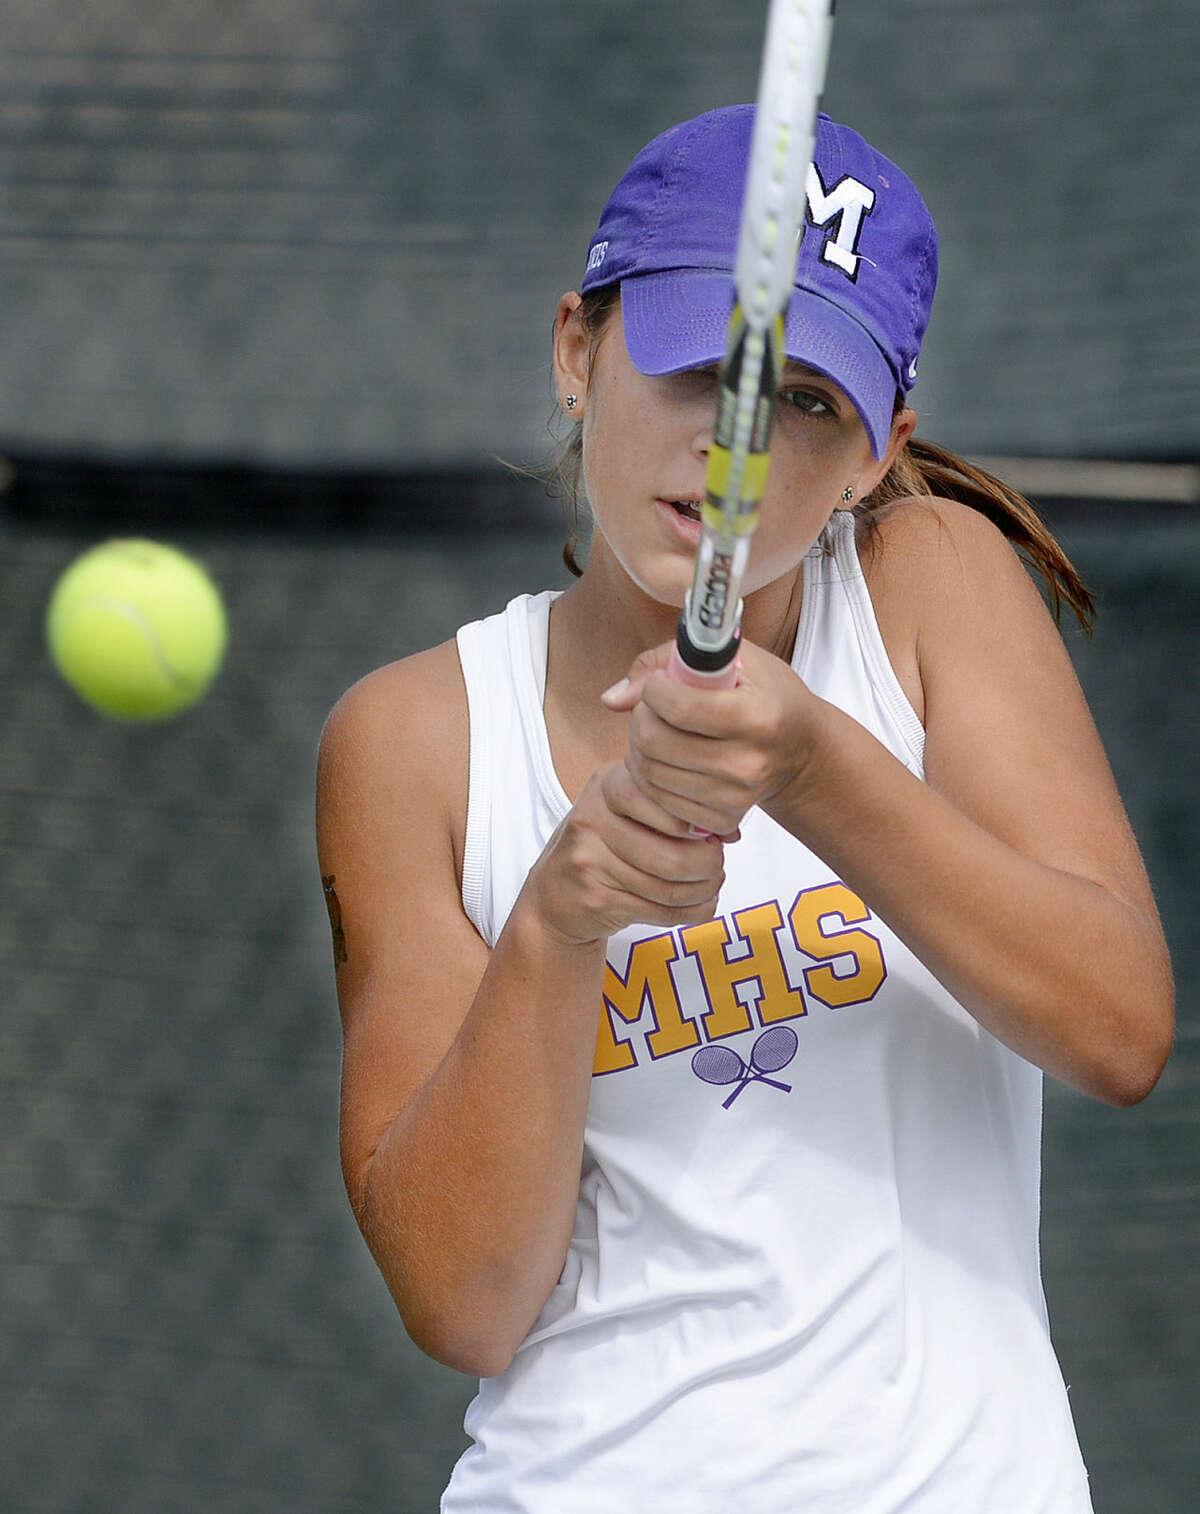 Midland High's Allison Stewart competes in the District 3-6A tennis match against Abilene High on Saturday, Sept. 12, 2015 at the Midland High Tennis Center. James Durbin/Reporter-Telegram